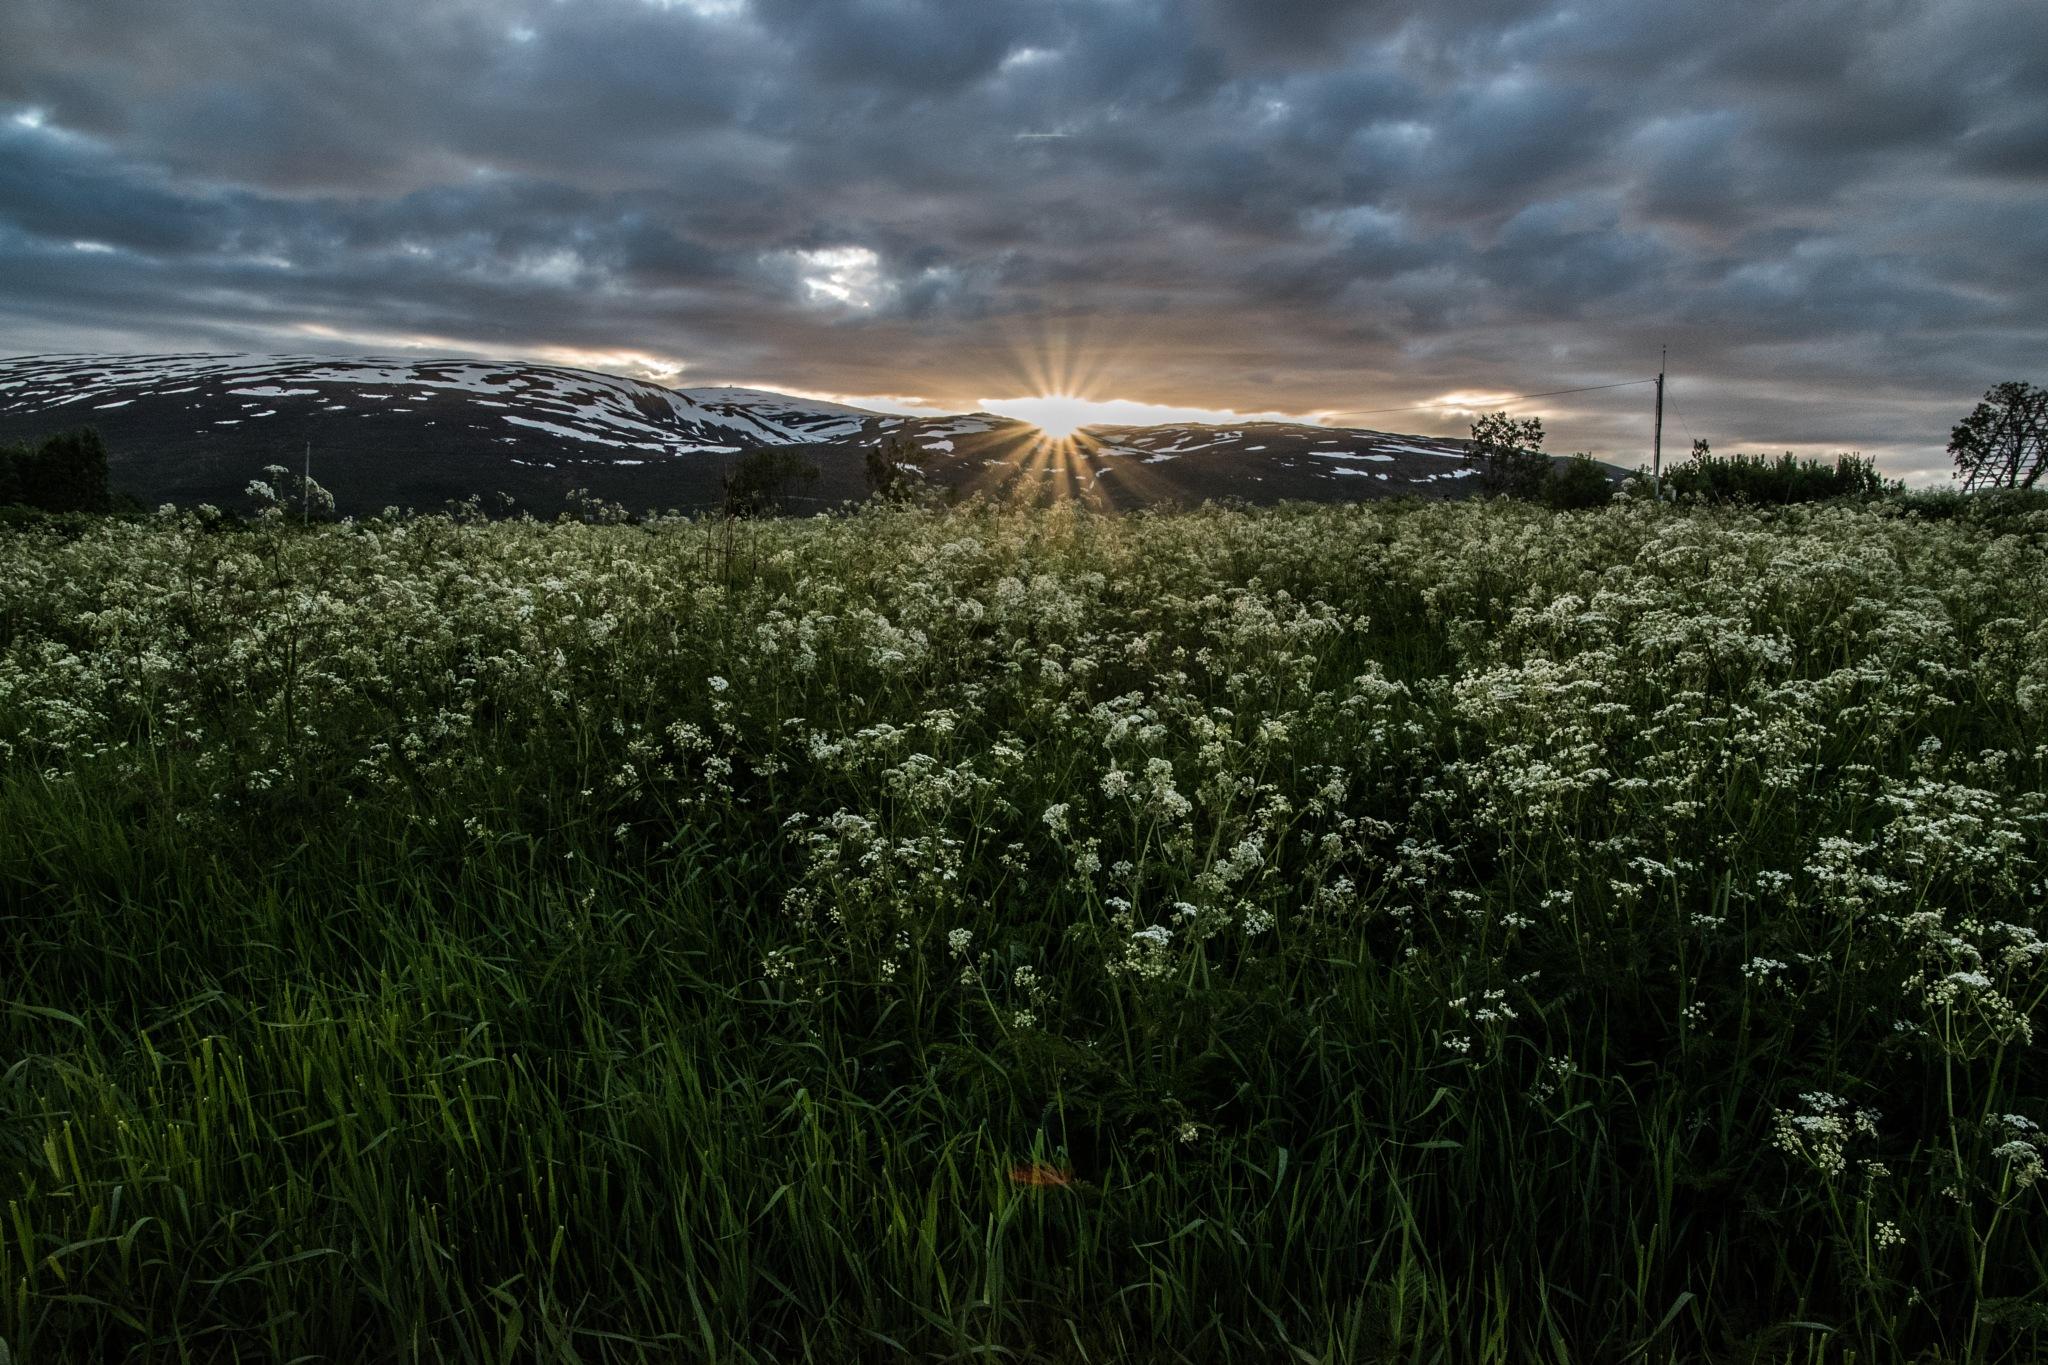 Midnight sun by SveinBorre